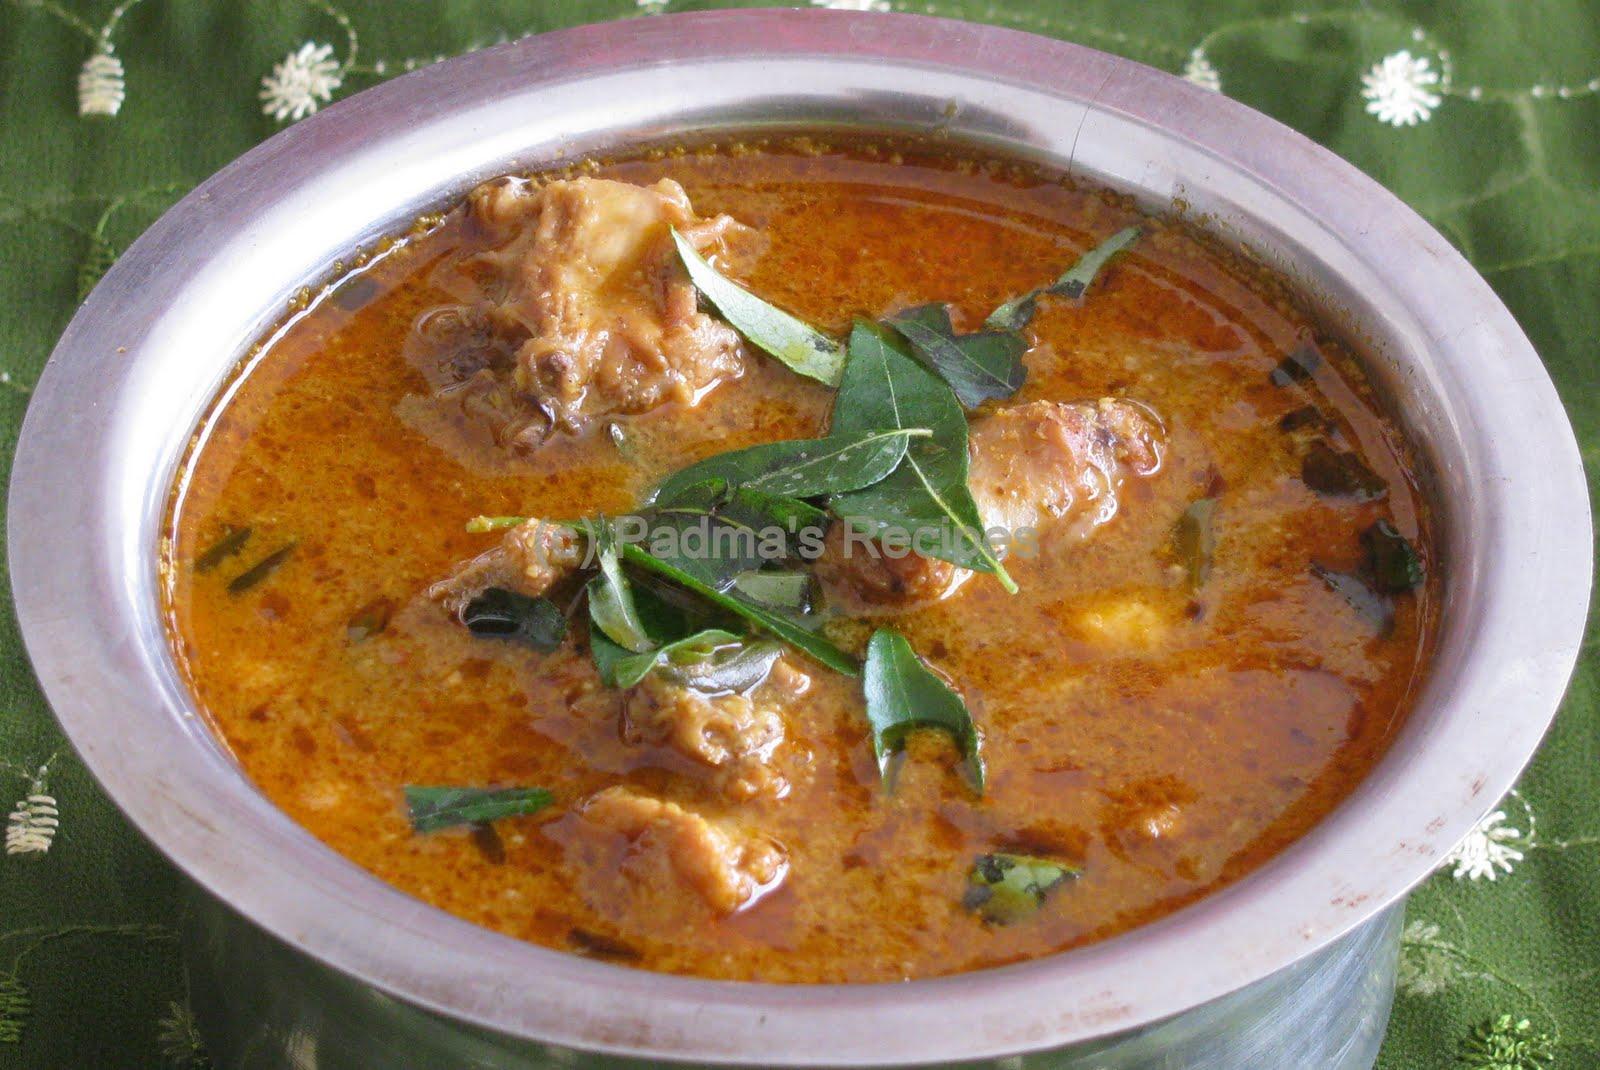 Padmas recipes spicy chicken gravy chicken kulambu 24 spicy chicken gravy chicken kulambu ccuart Images